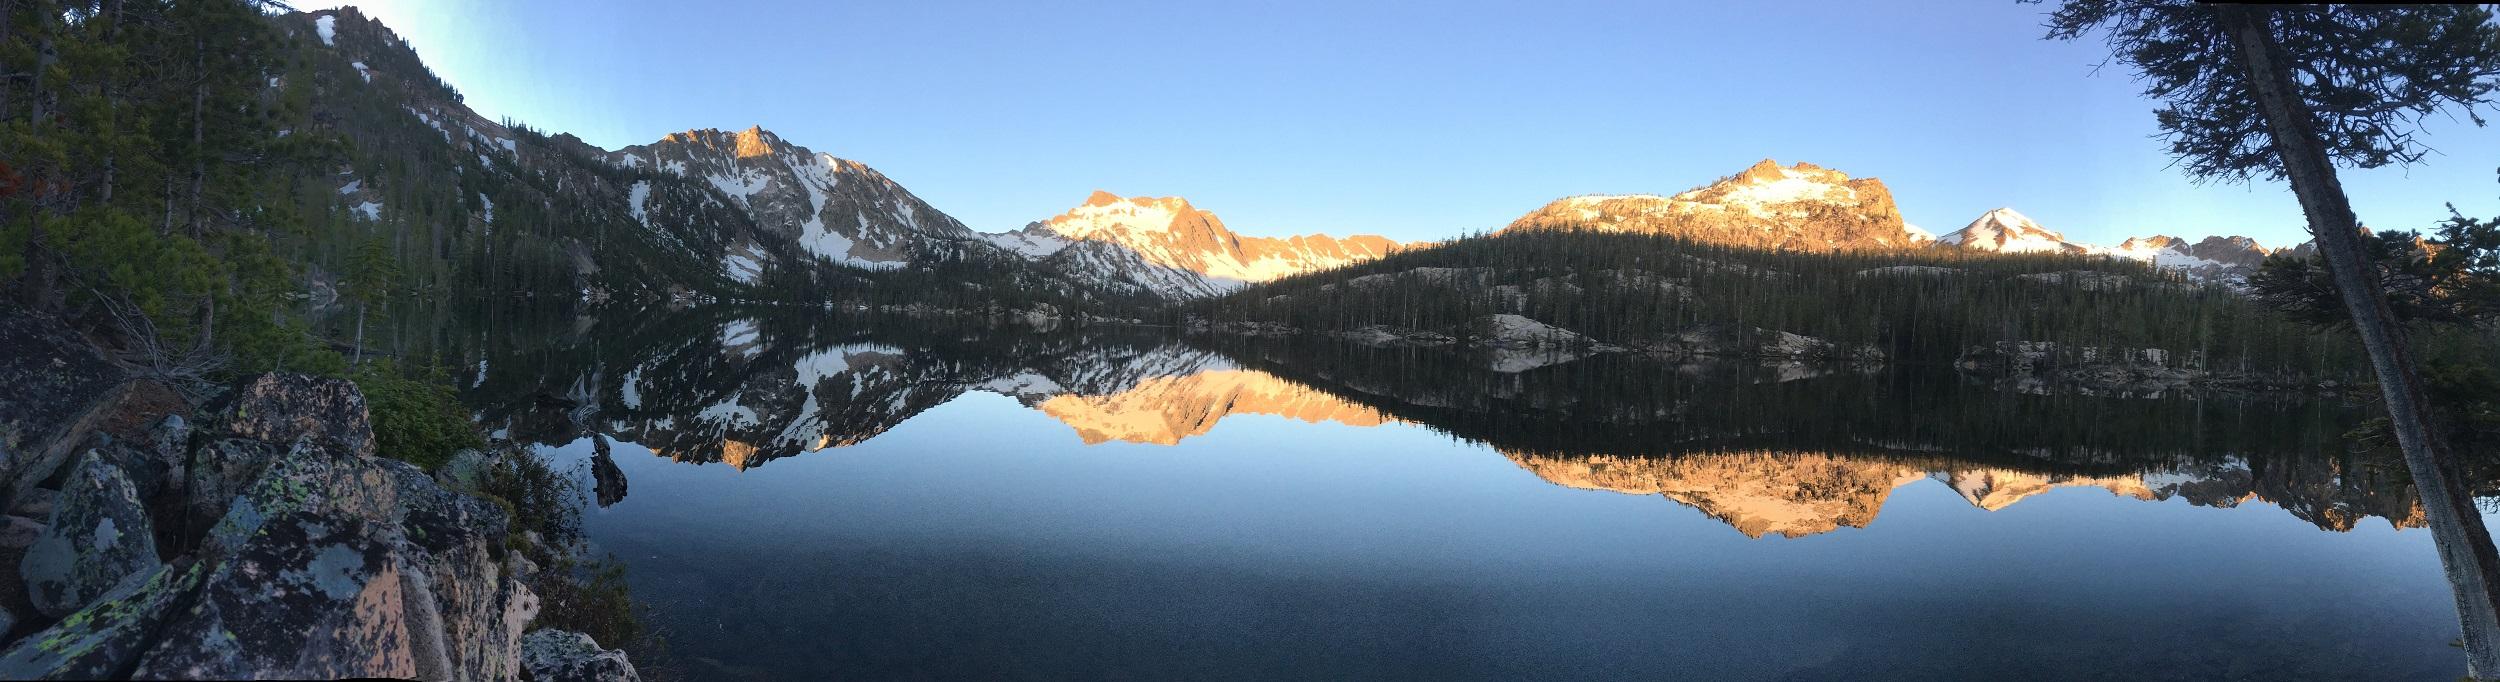 Morning golden hour, crisp and clear, at Imogene Lake.